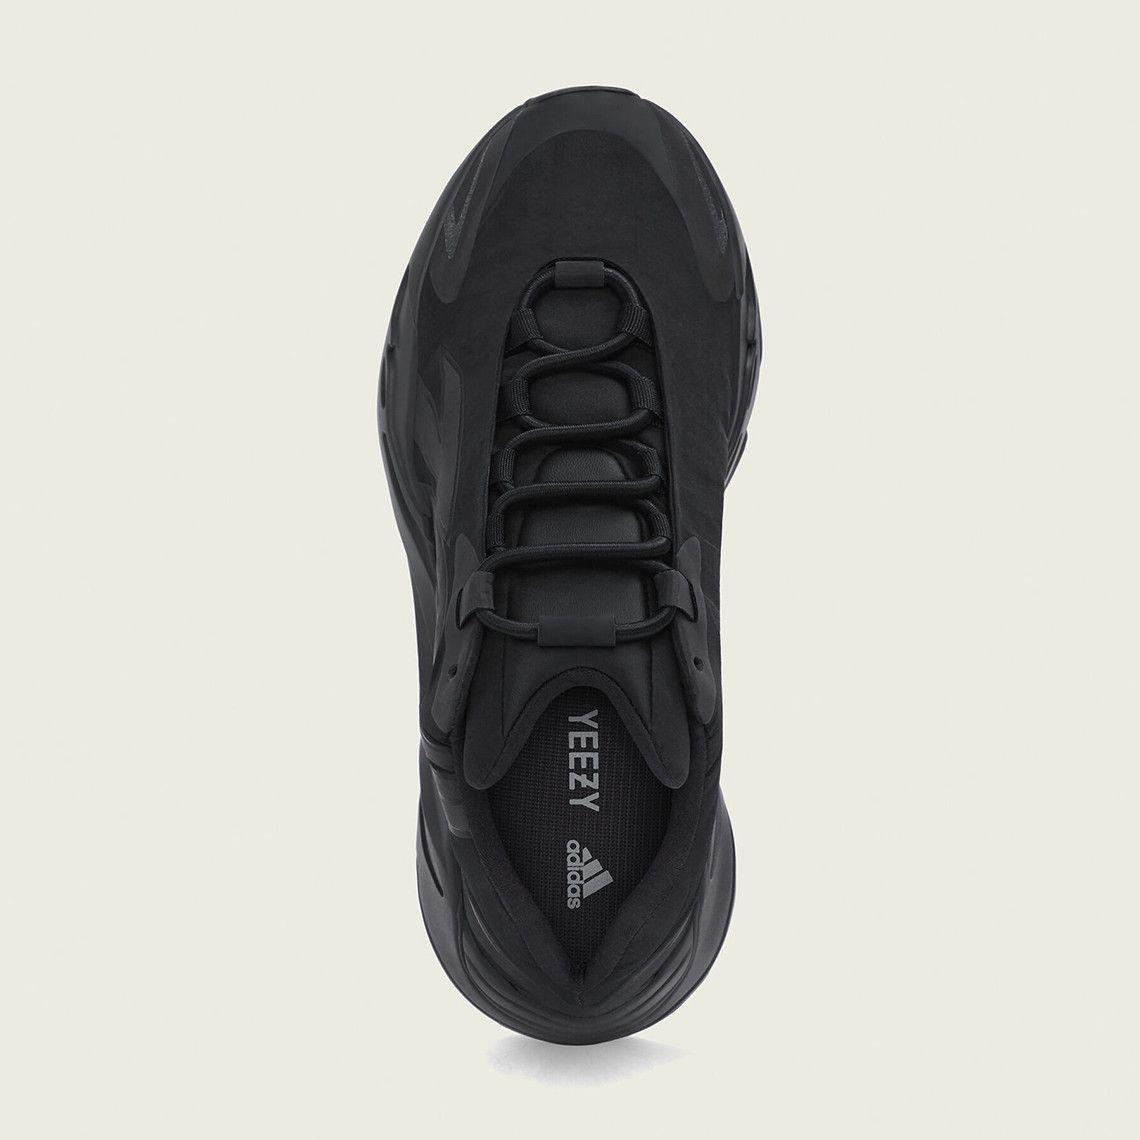 The adidas Yeezy Boost 700 MNVN Triple